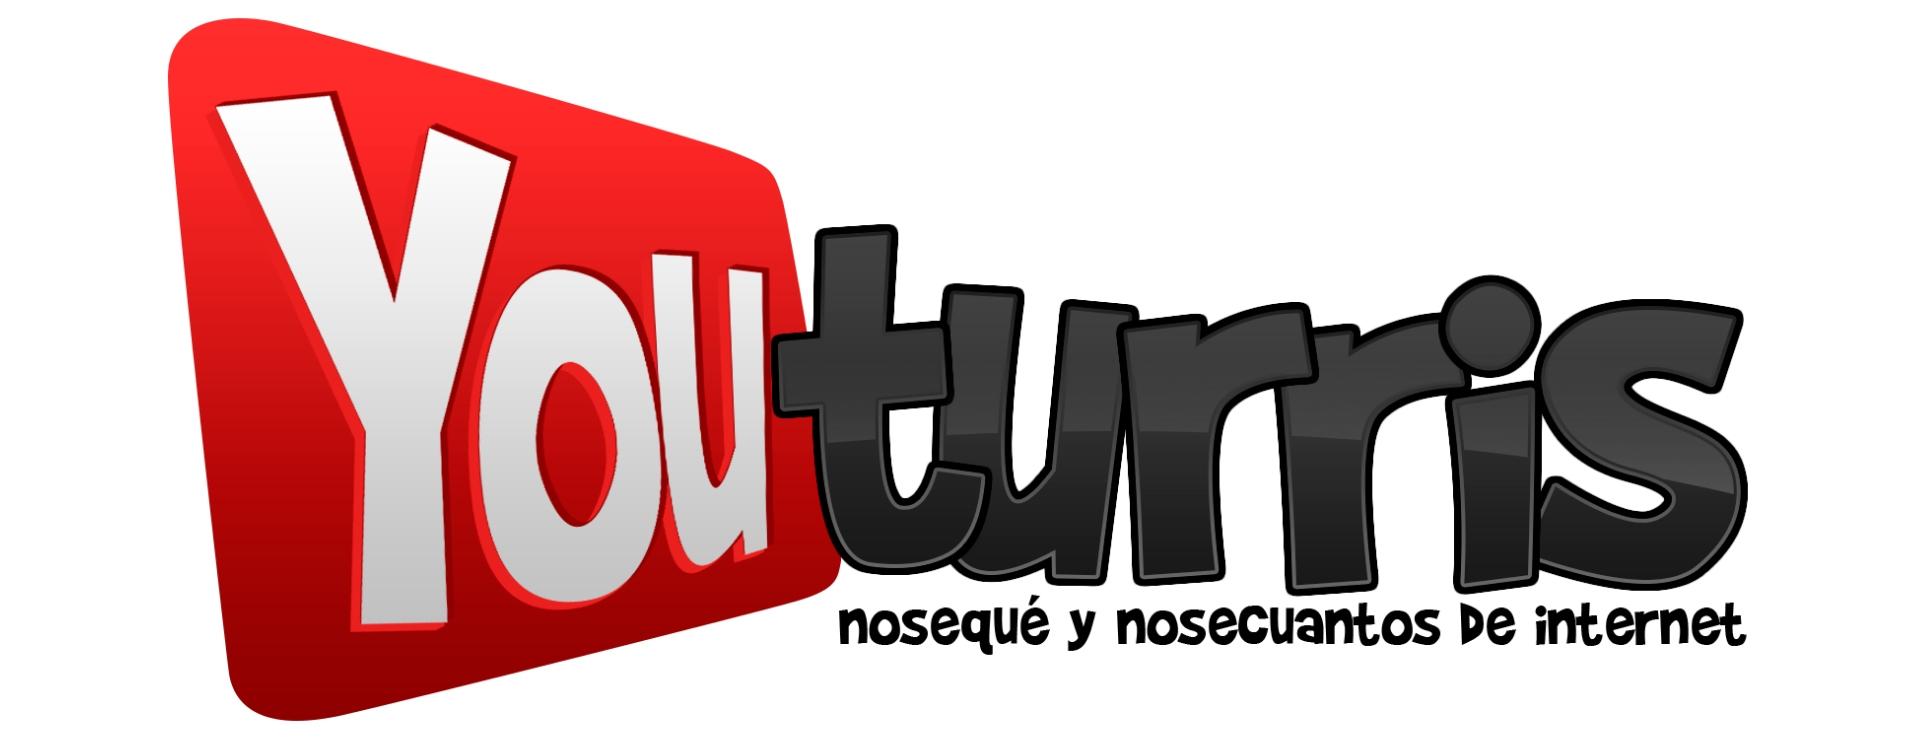 Youturris